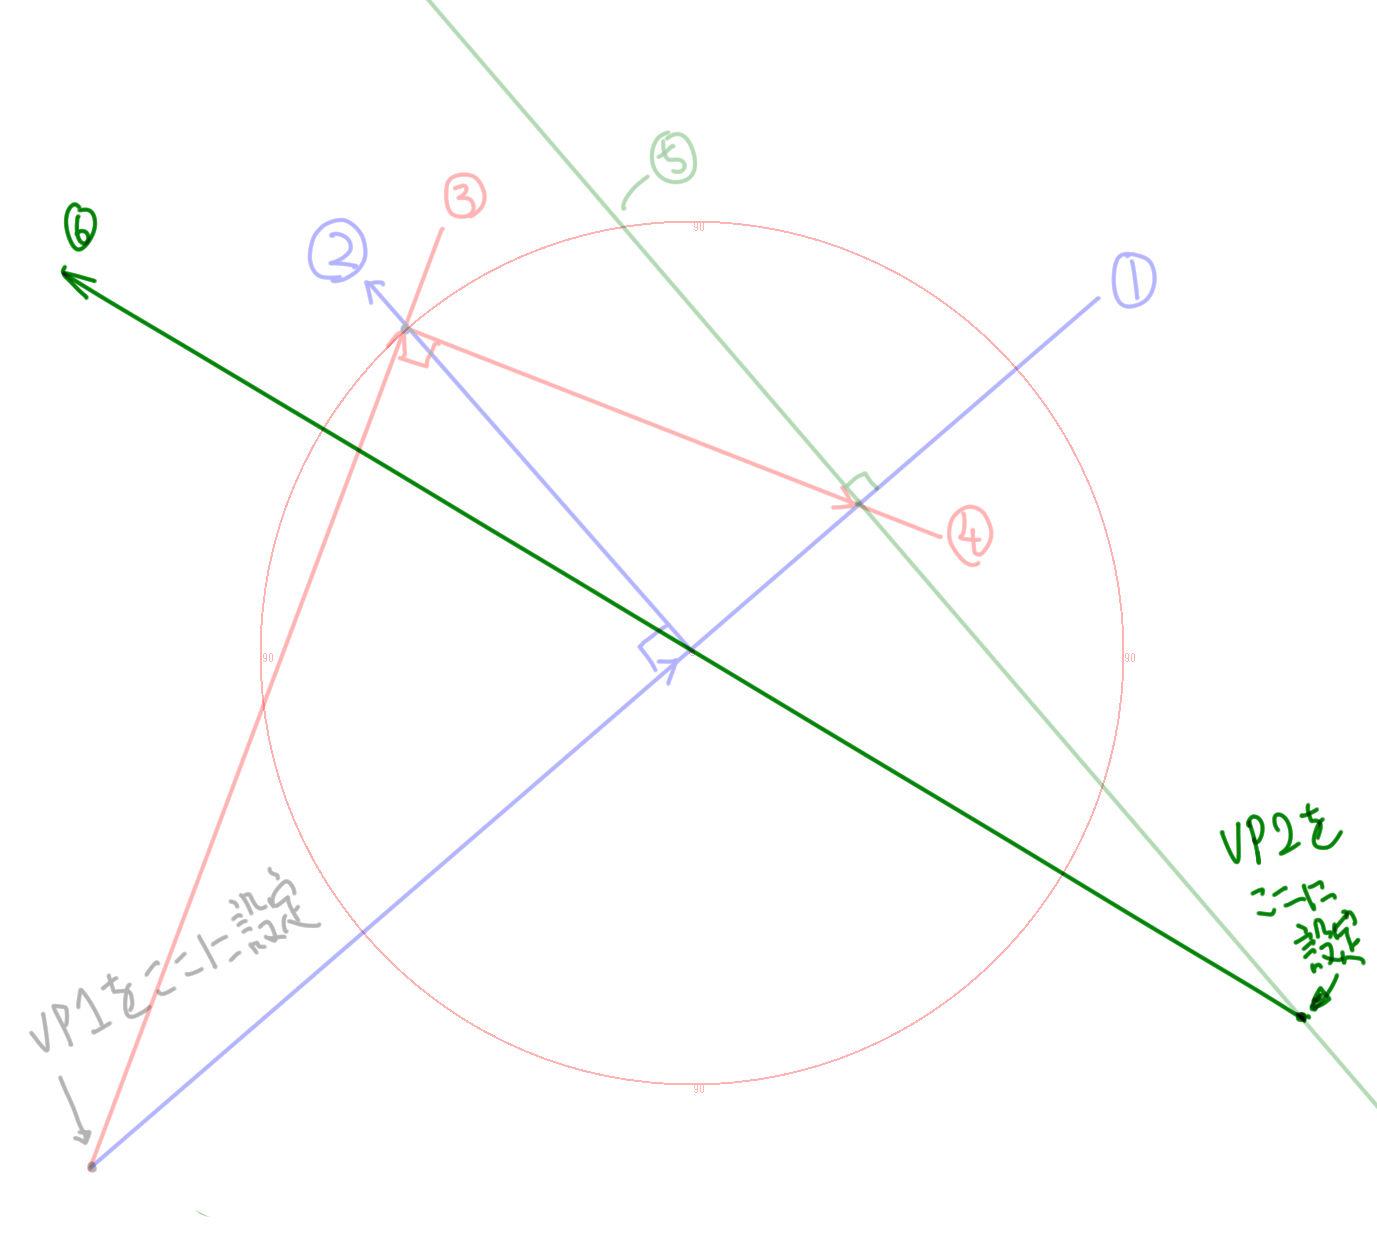 toushizuVP3-4.jpg